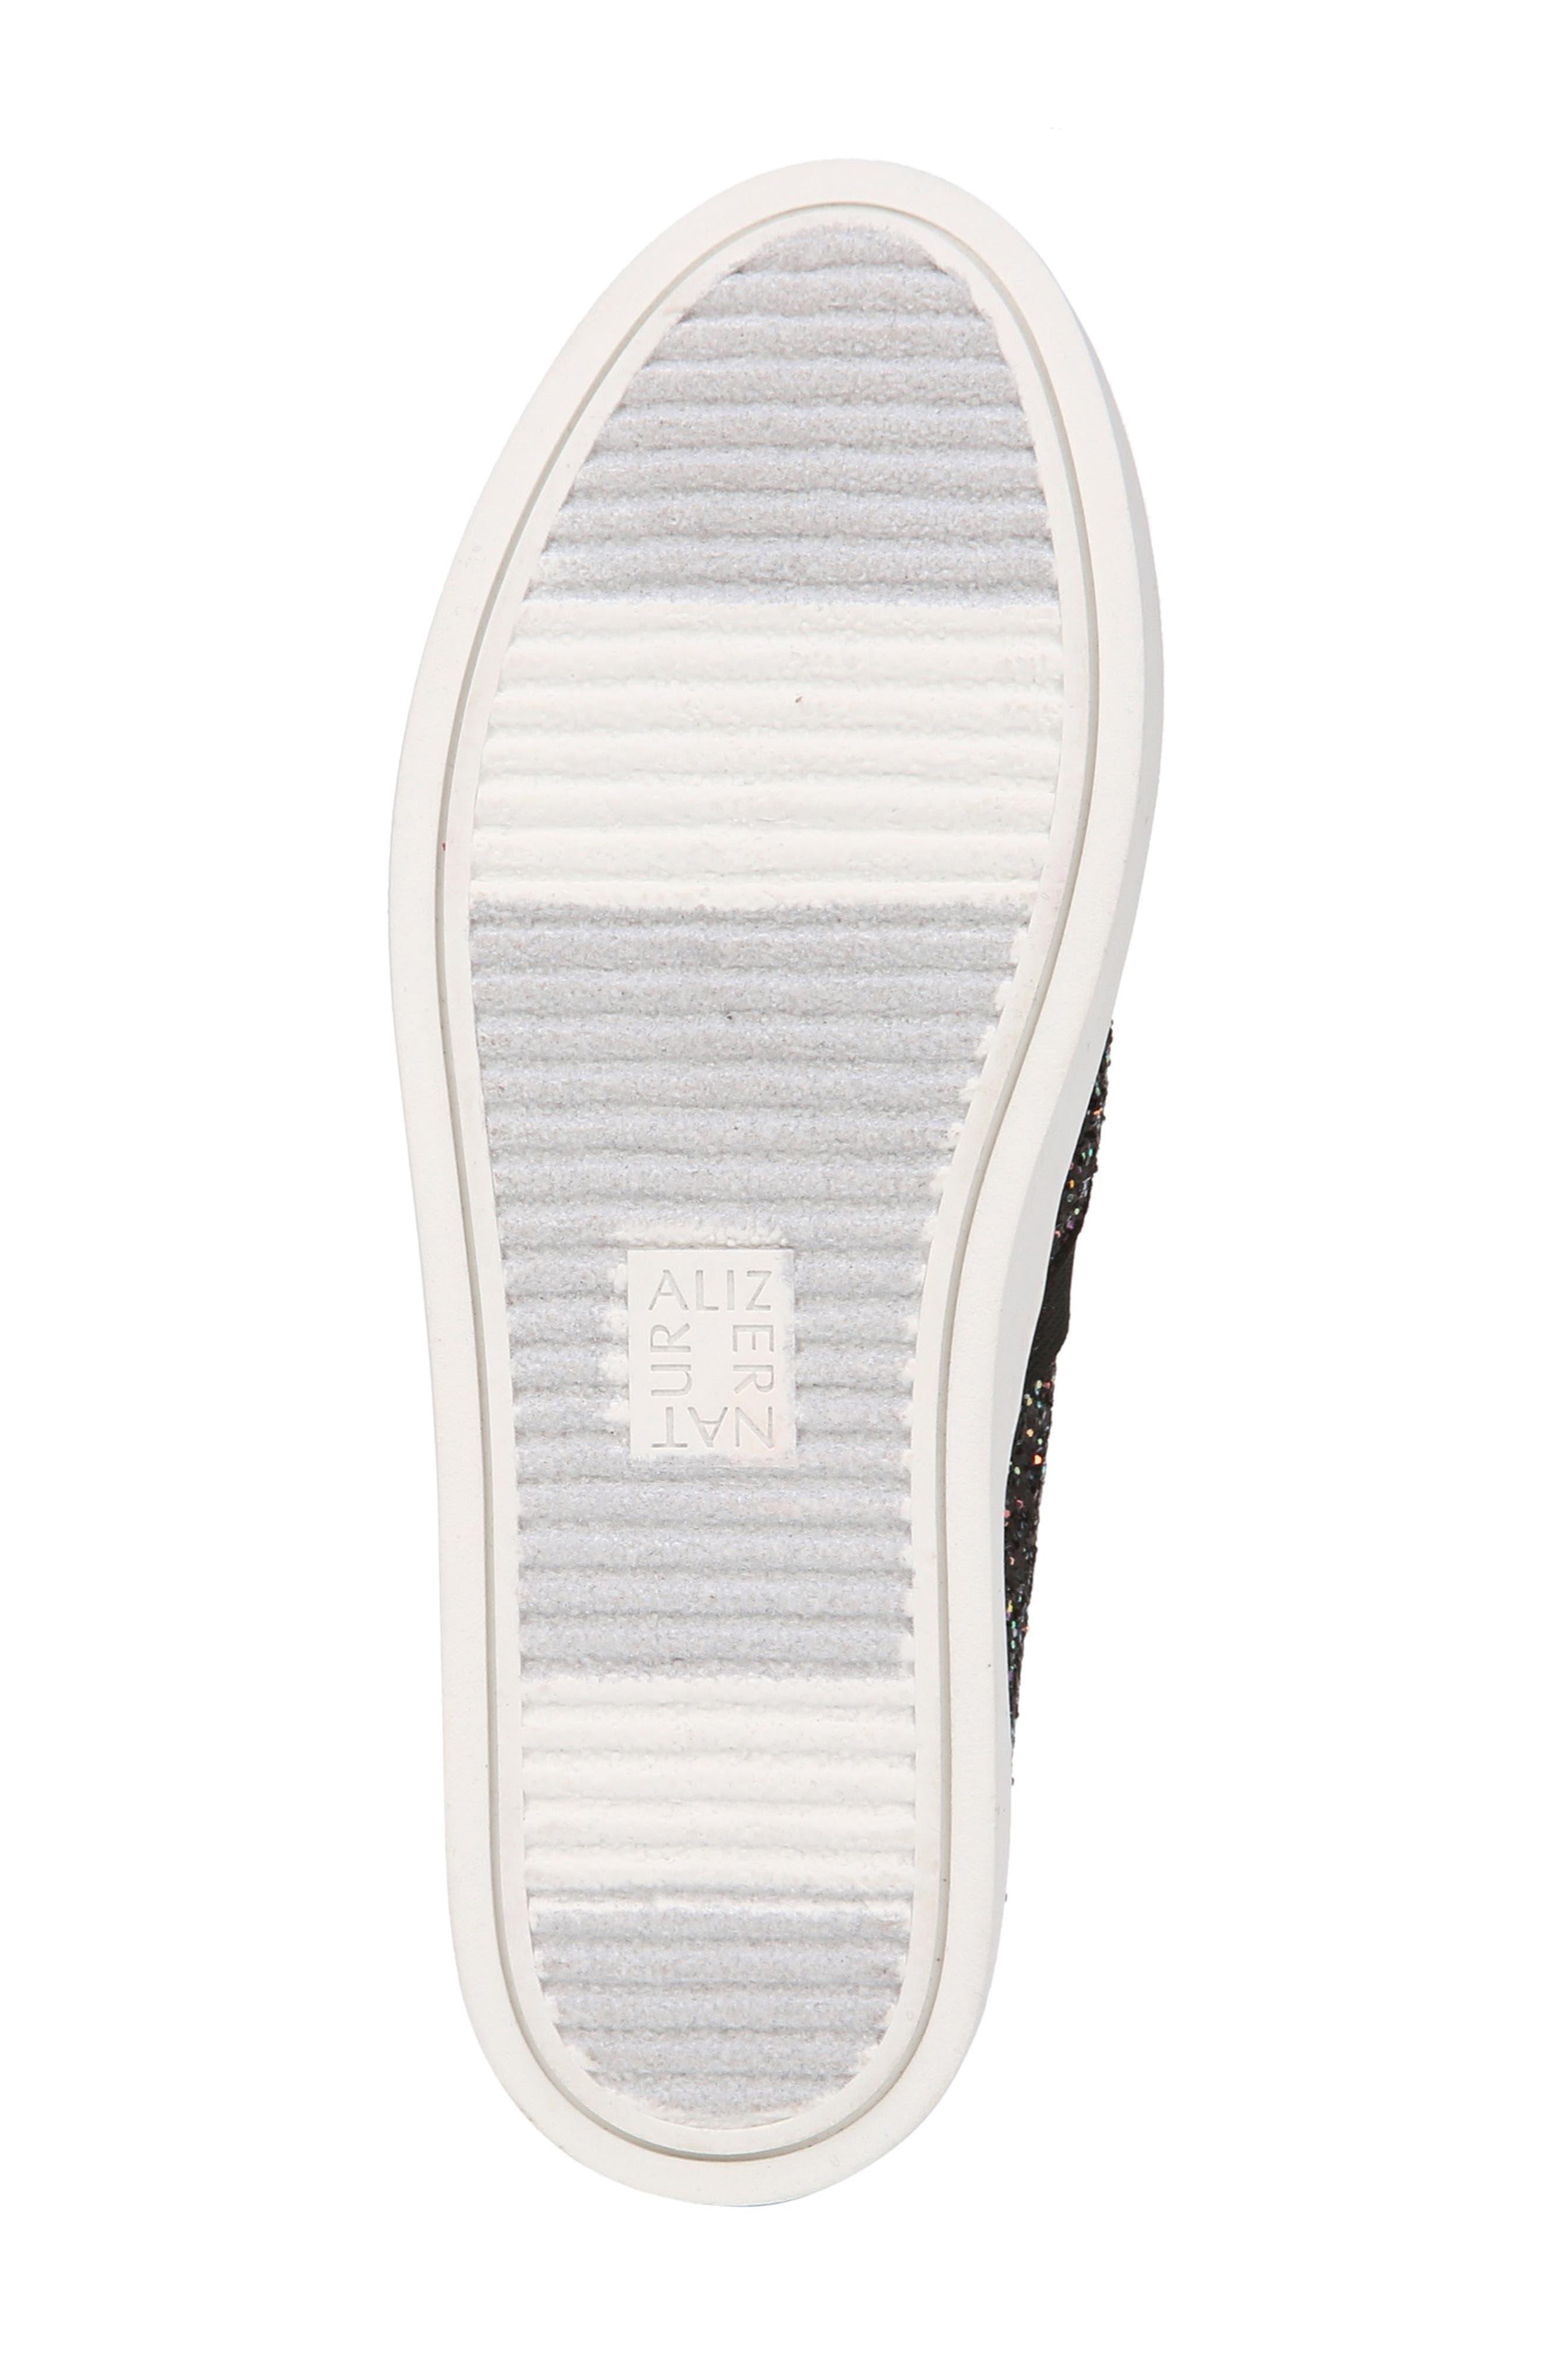 NATURALIZER, Carly Slip-On Sneaker, Alternate thumbnail 2, color, MULTI GLITTER FABRIC